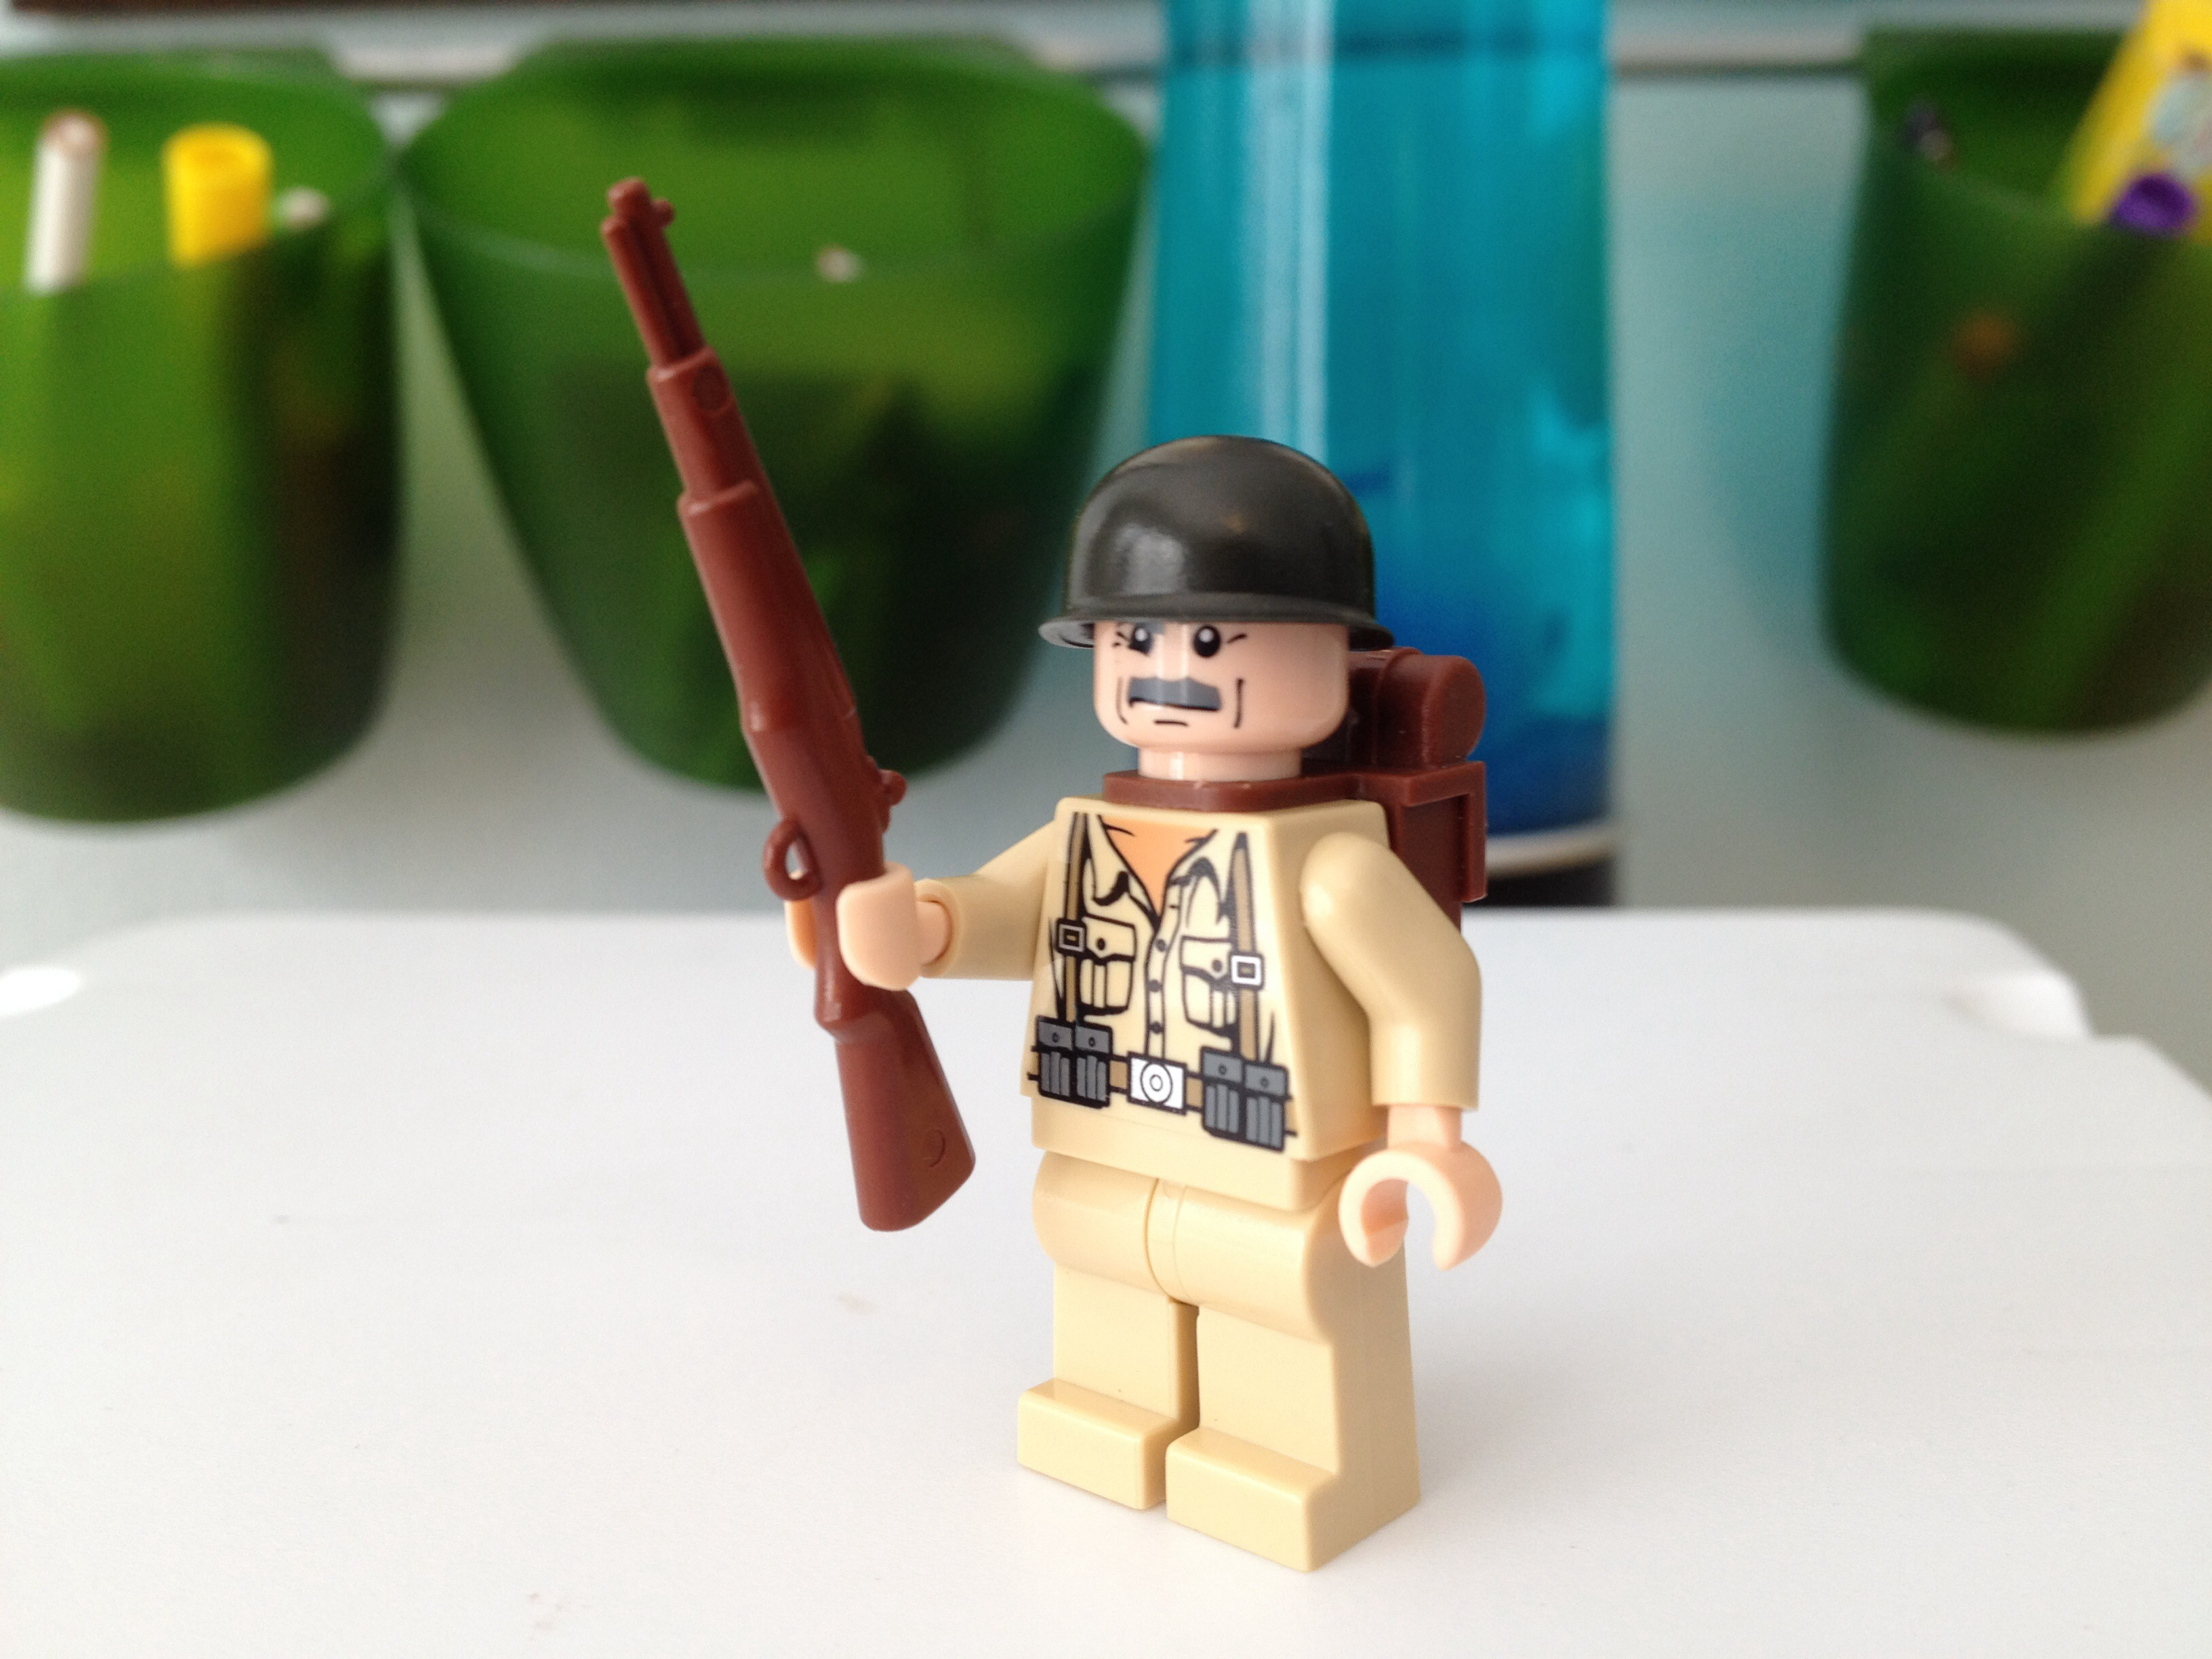 Lego American Soldier